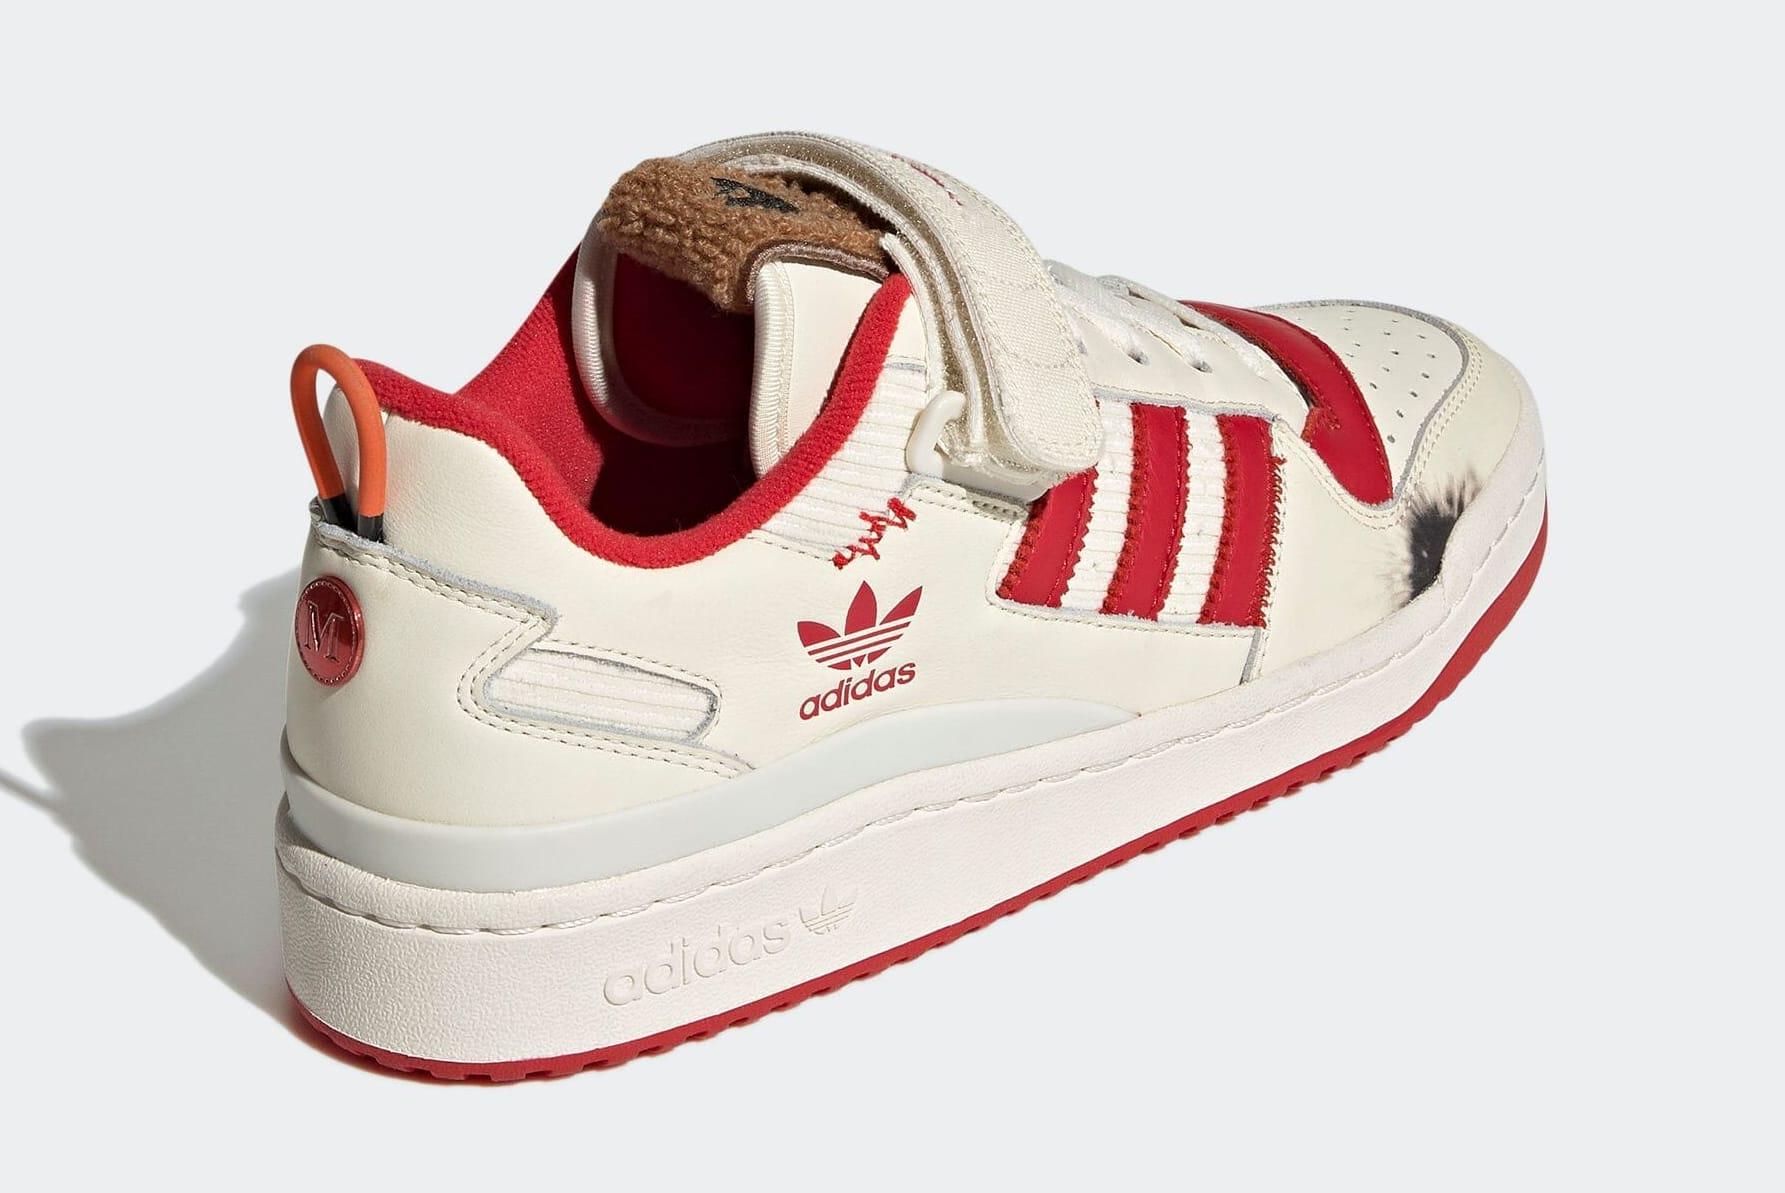 Home Alone x Adidas Forum Low GZ4378 Heel